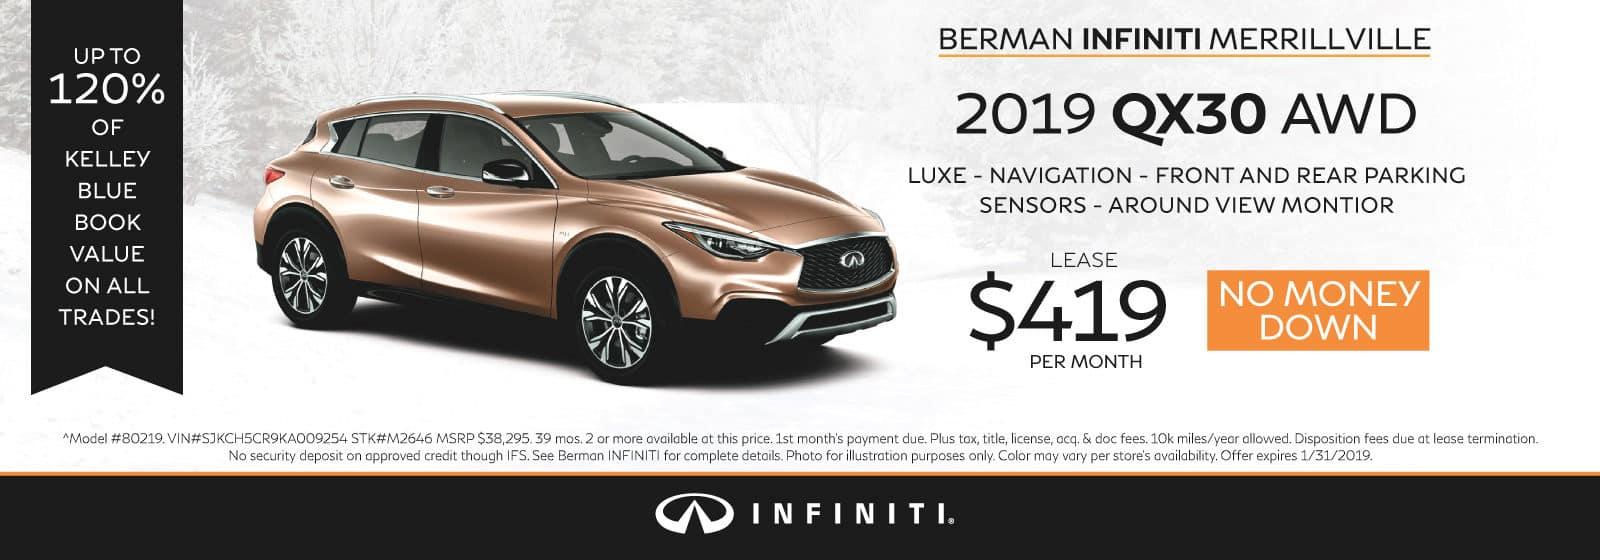 New 2019 INFINITI QX30 January Offer at Berman INFINITI of Merrillville!